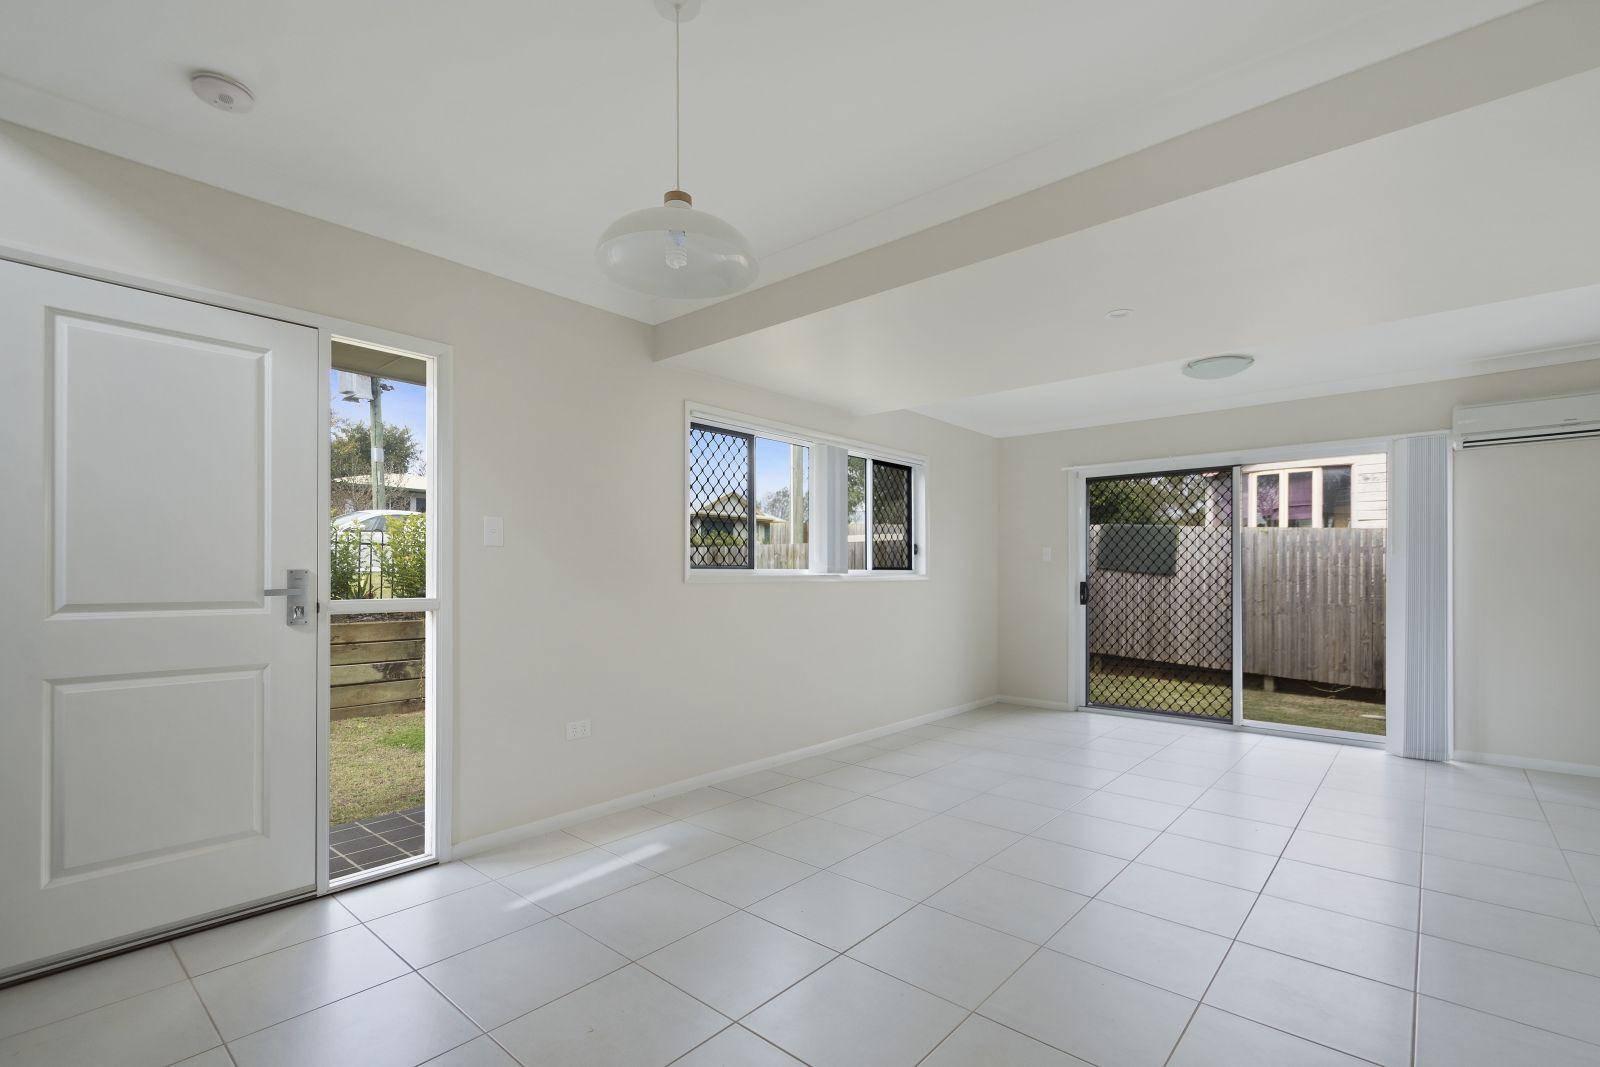 6/11 O'Brien Street, Toowoomba QLD 4350, Image 2